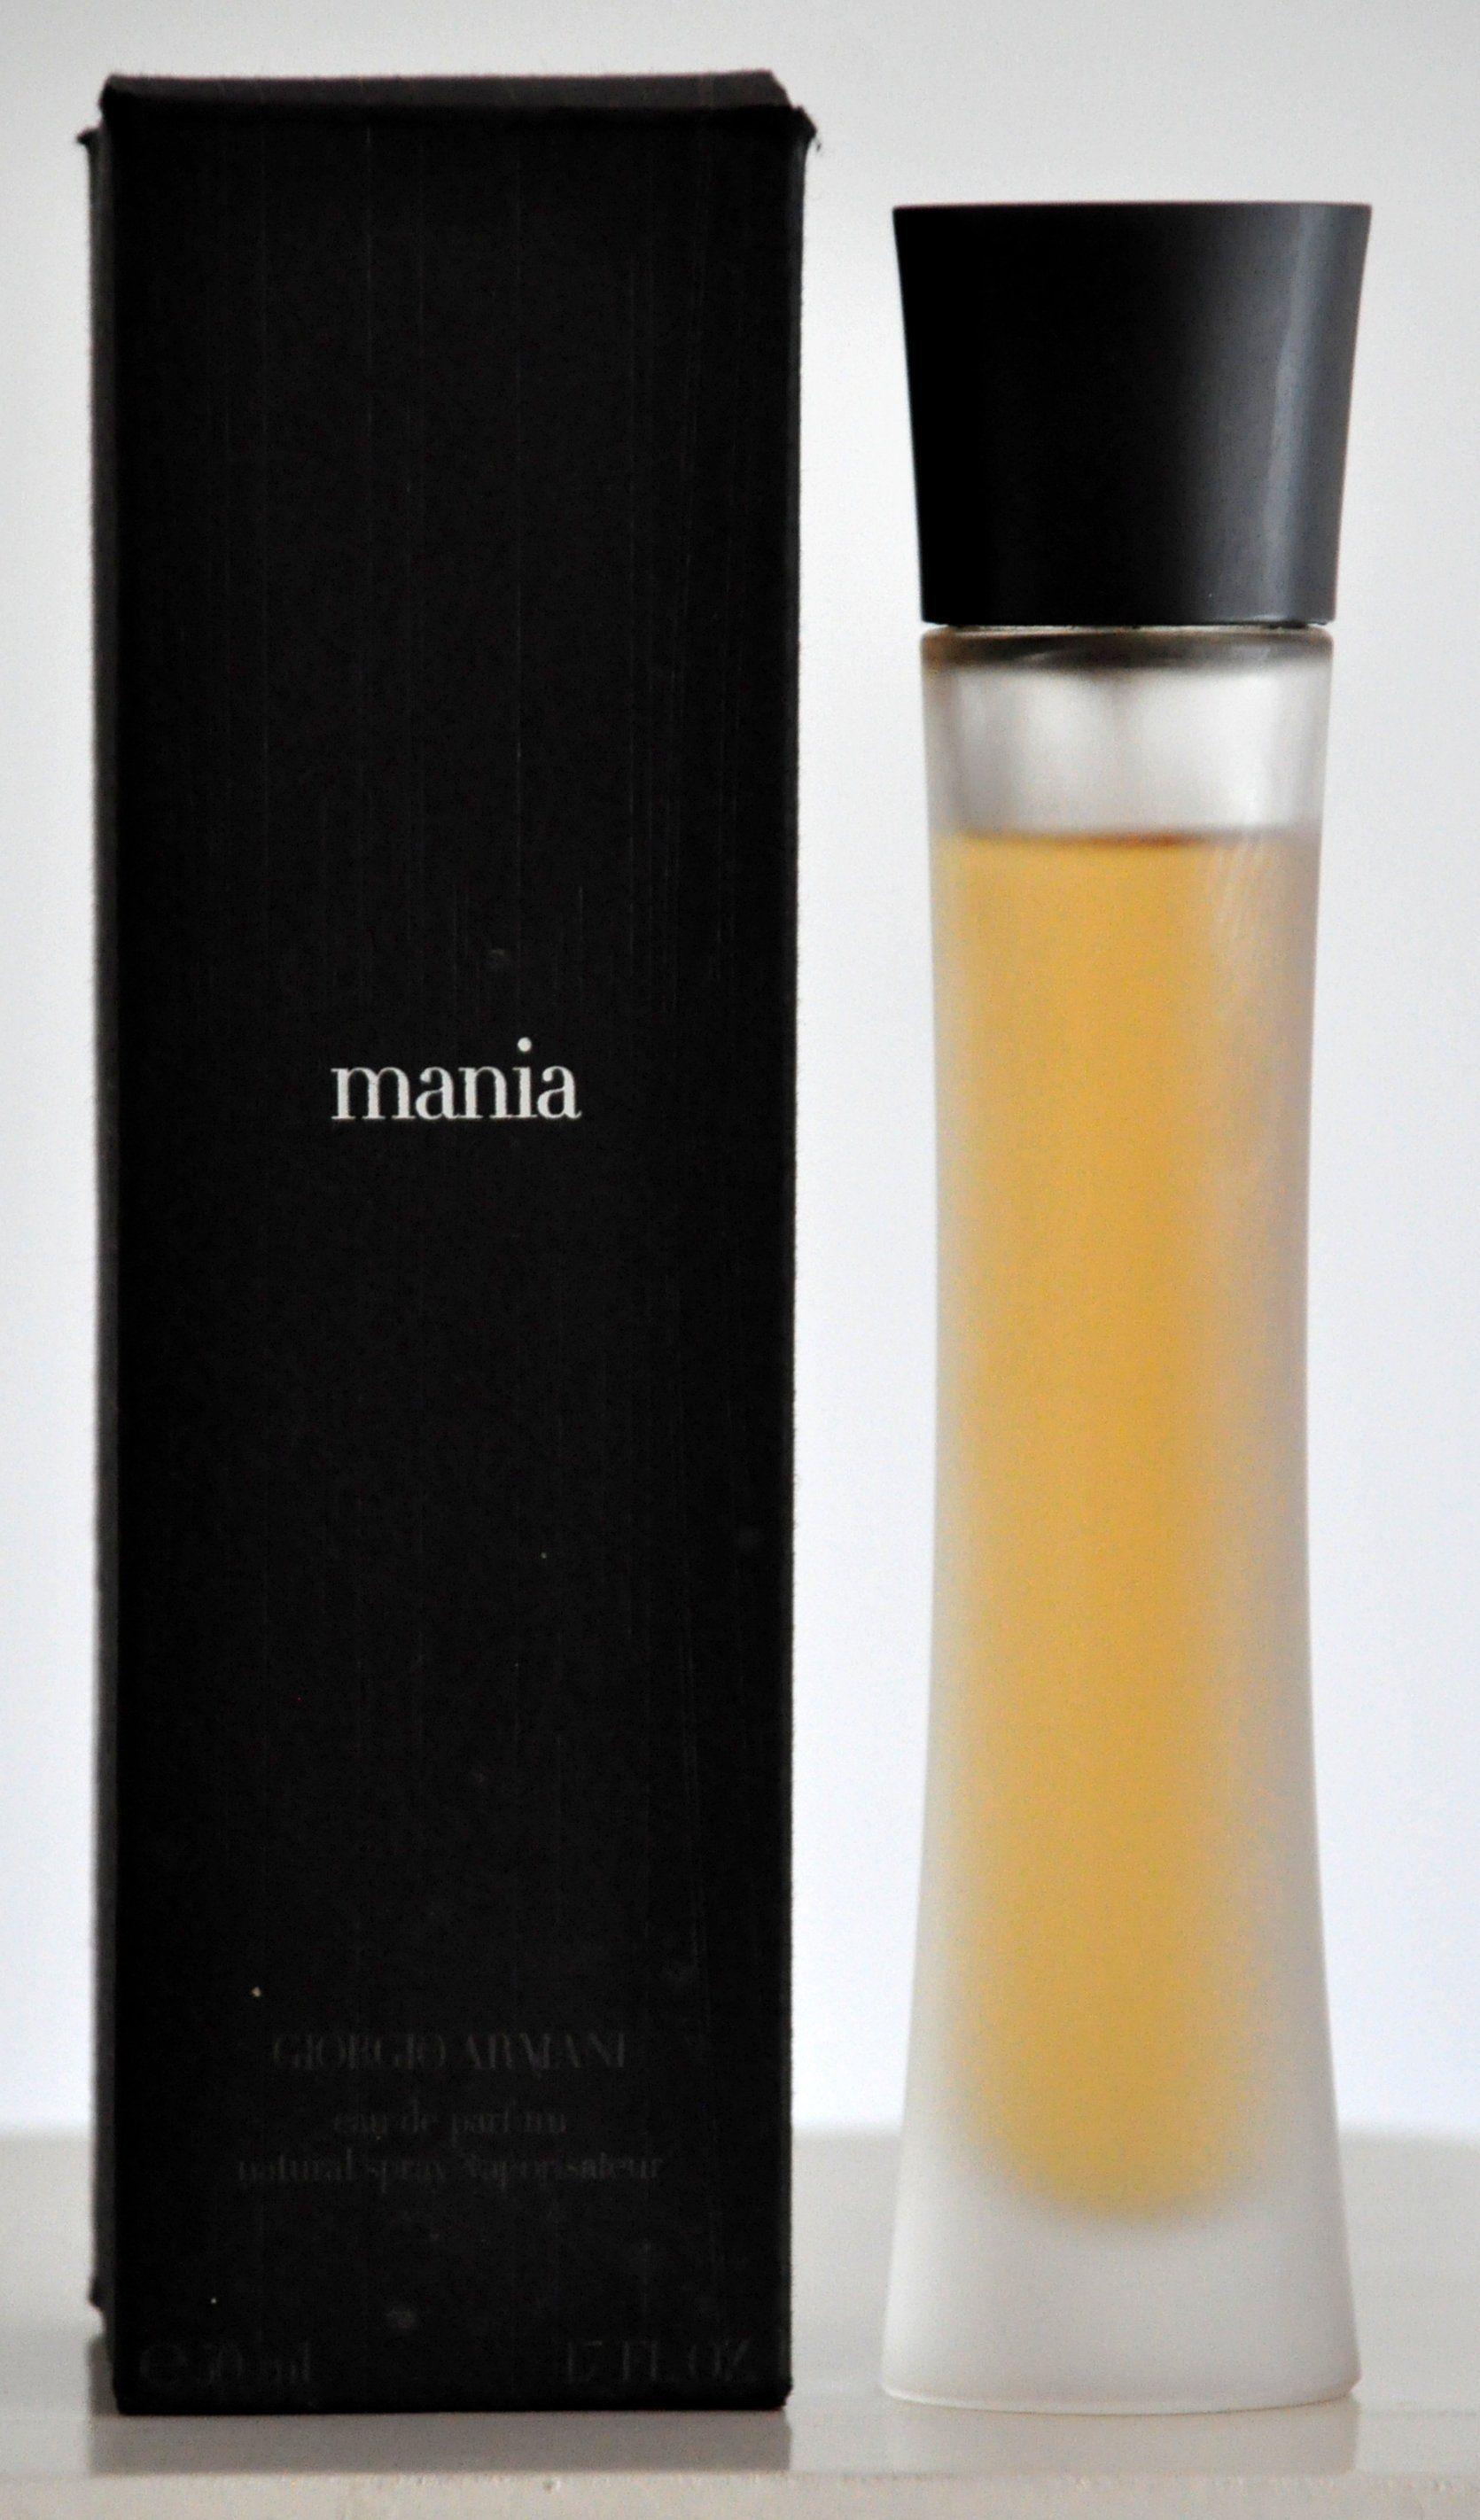 951a35bea1a Giorgio Armani Mania Eau de Parfum Edp 50ML Spray Profumo Donna Raro  Vintage di YourVintagePerfume su Etsy